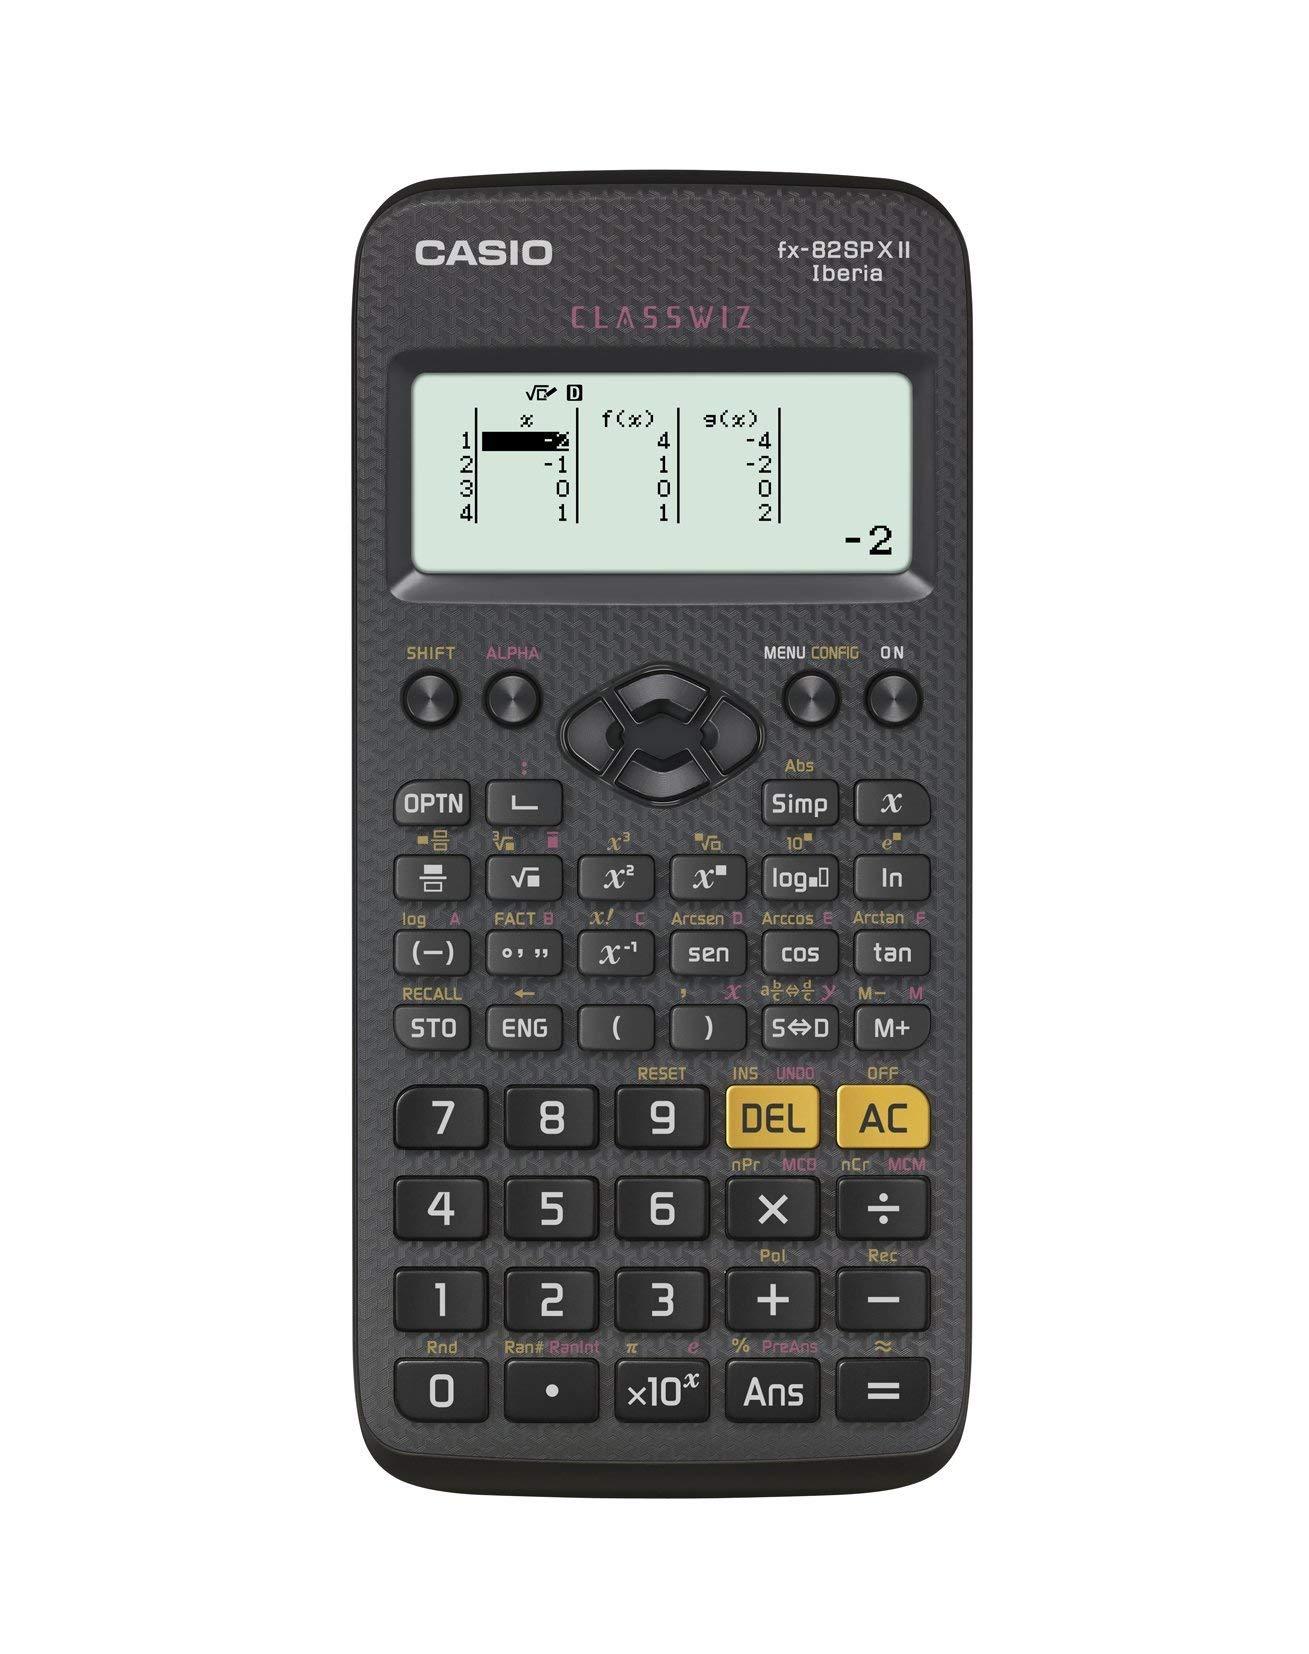 Casio FX-82SPXII Iberia - Calculadora científica (293 funciones, 24 niveles de paréntesis